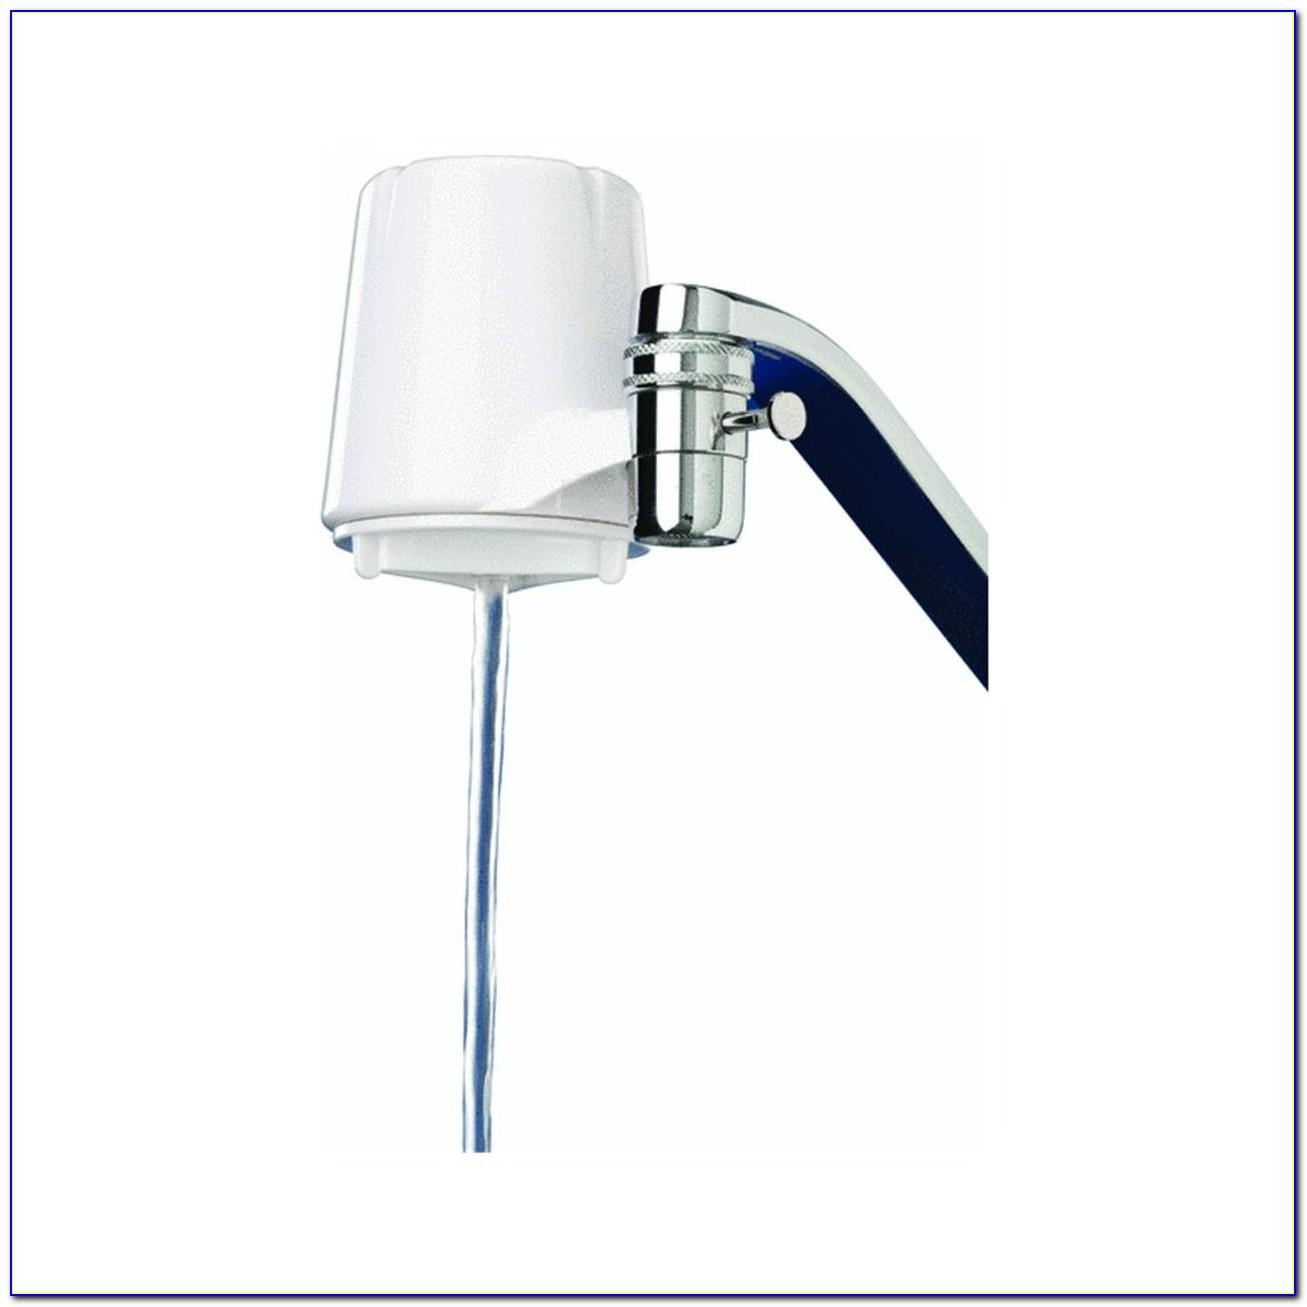 Best Faucet Mounted Water Filter 2014 Best Faucet Mounted Water Filter 2014 Faucet Water Filter Reviews Water Filters Center 1280 X 1280